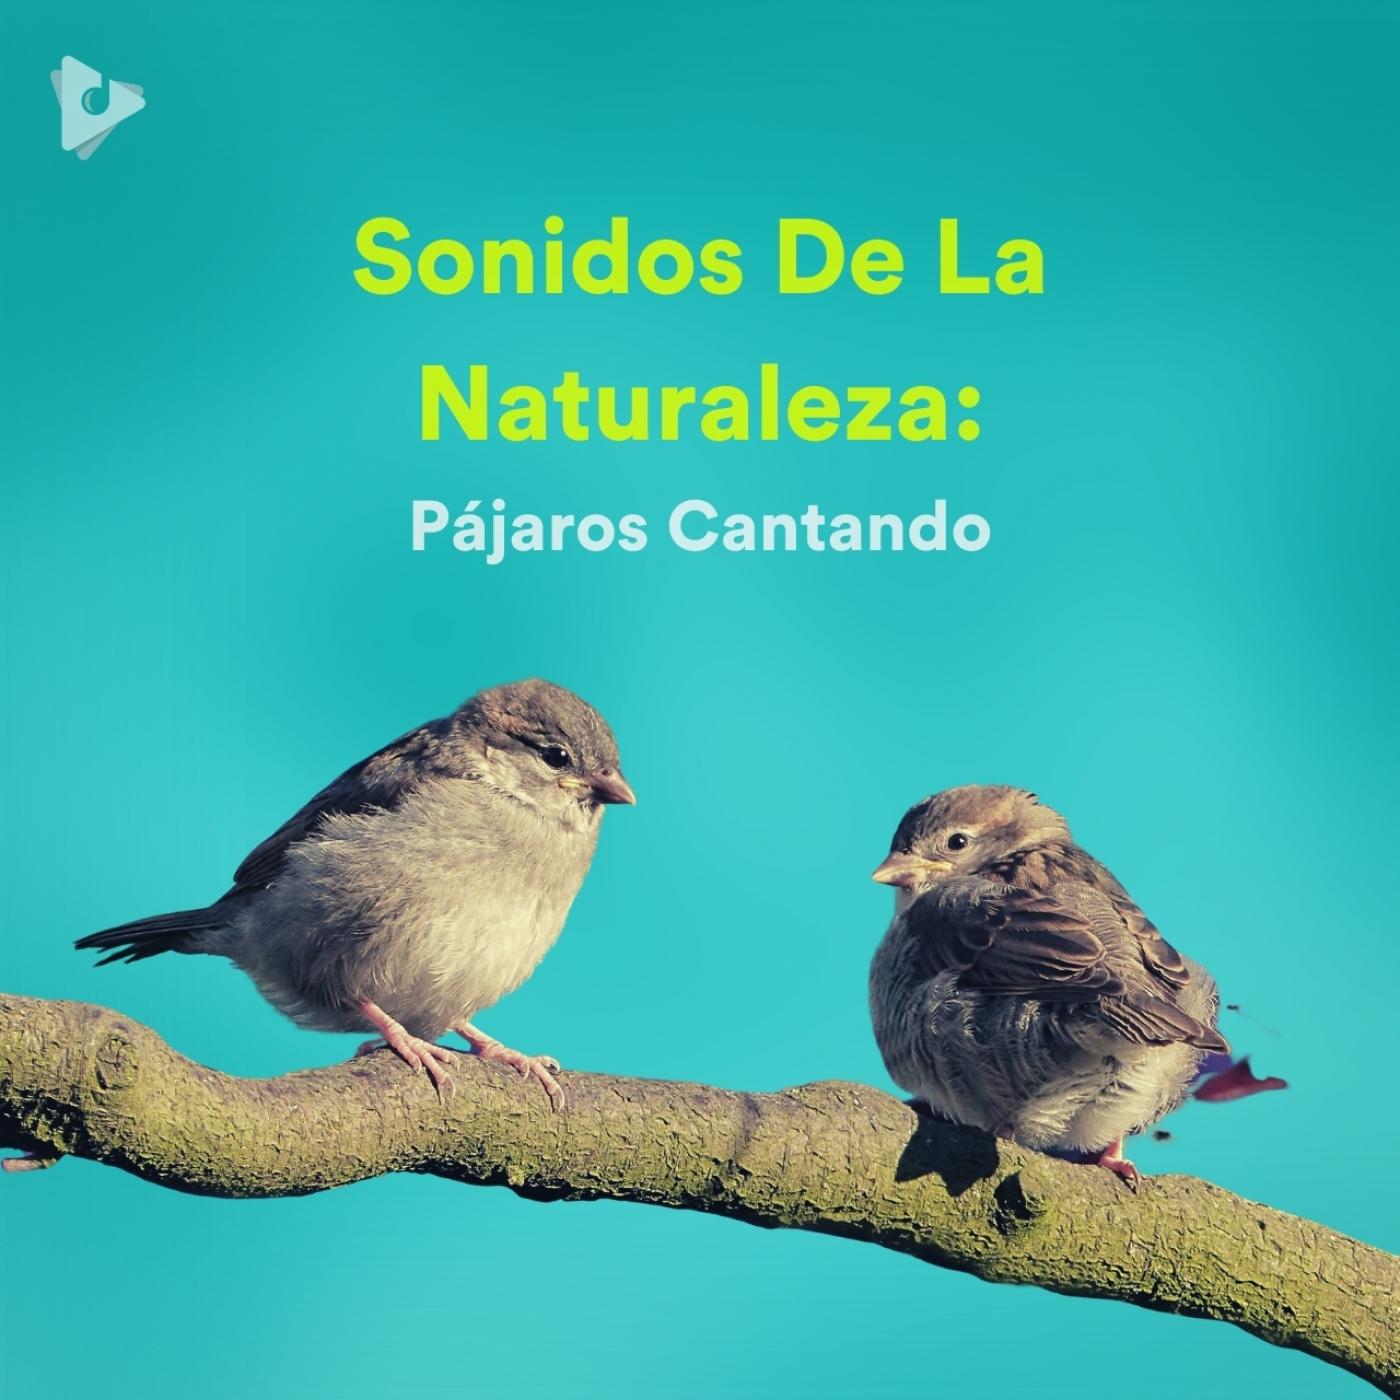 Sonidos De La Naturaleza: Pájaros Cantando